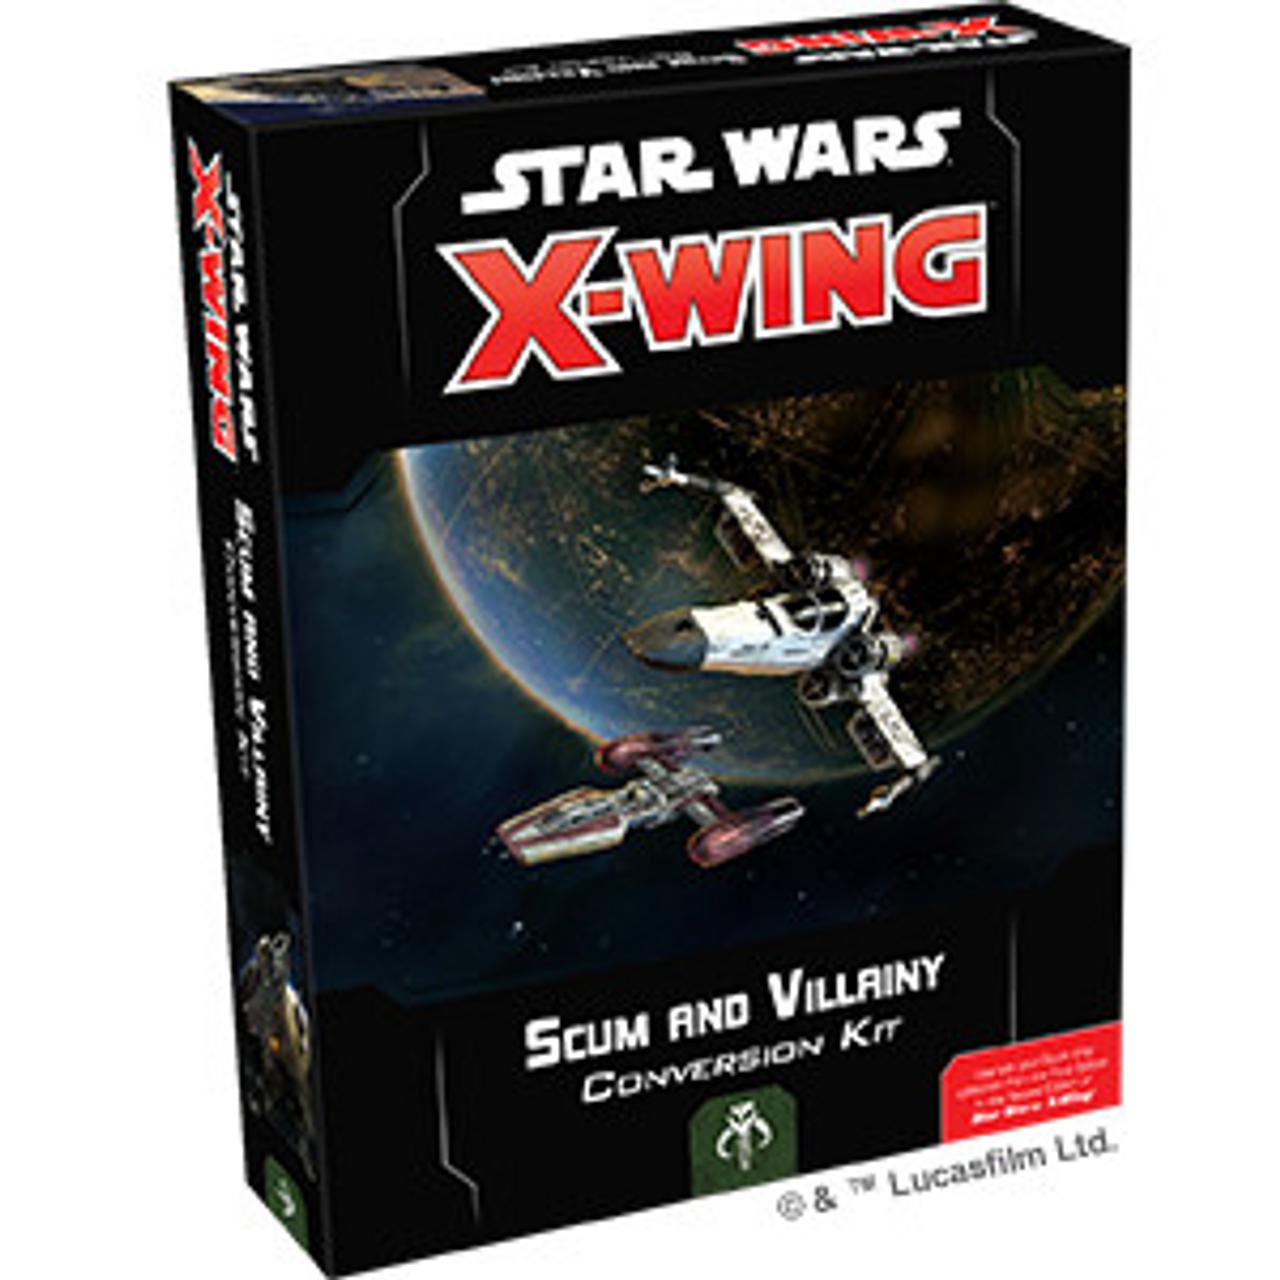 Star Wars X wing 2nd Ed Rebel Alliance Conversion Kit